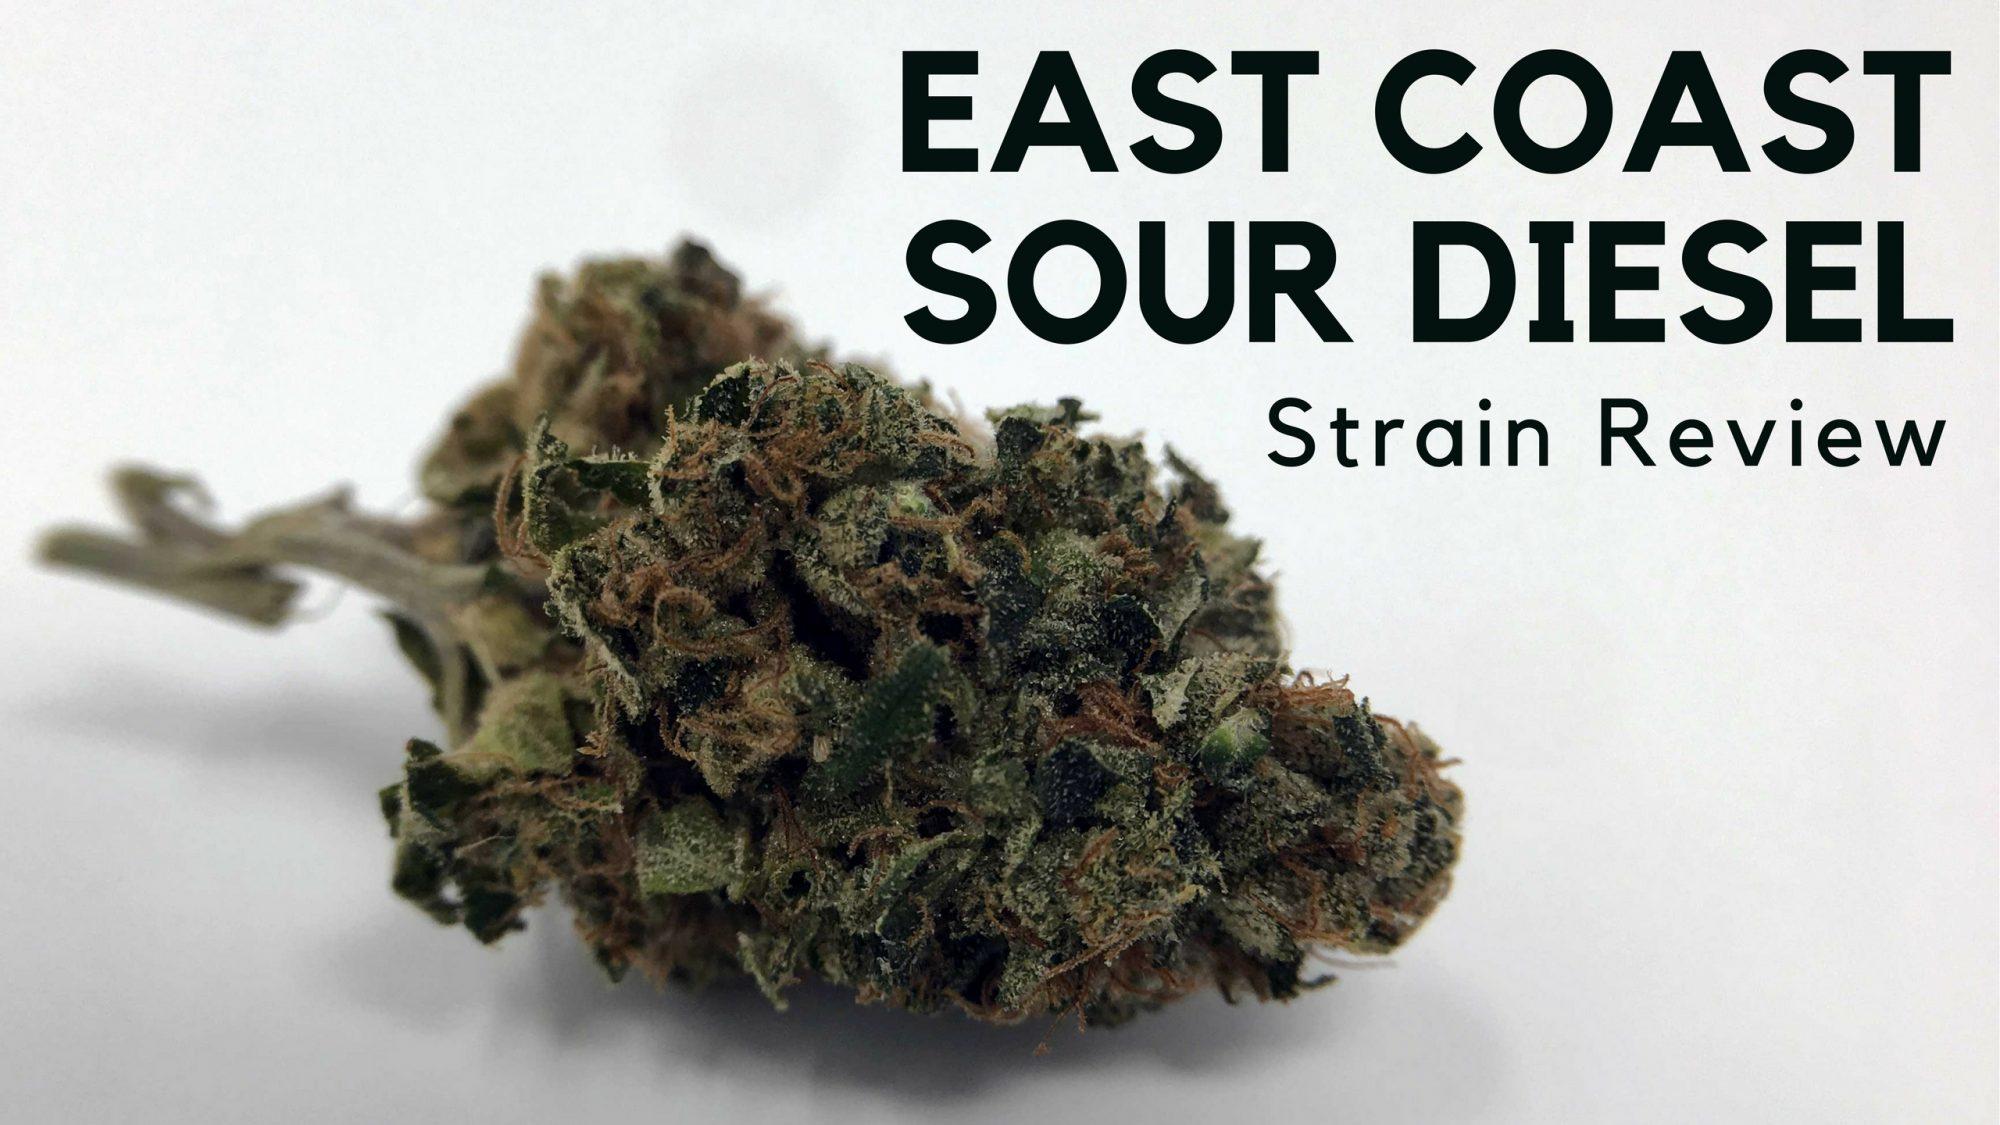 East Coast Diesel >> East Coast Sour Diesel Cannabis Strain Information Review